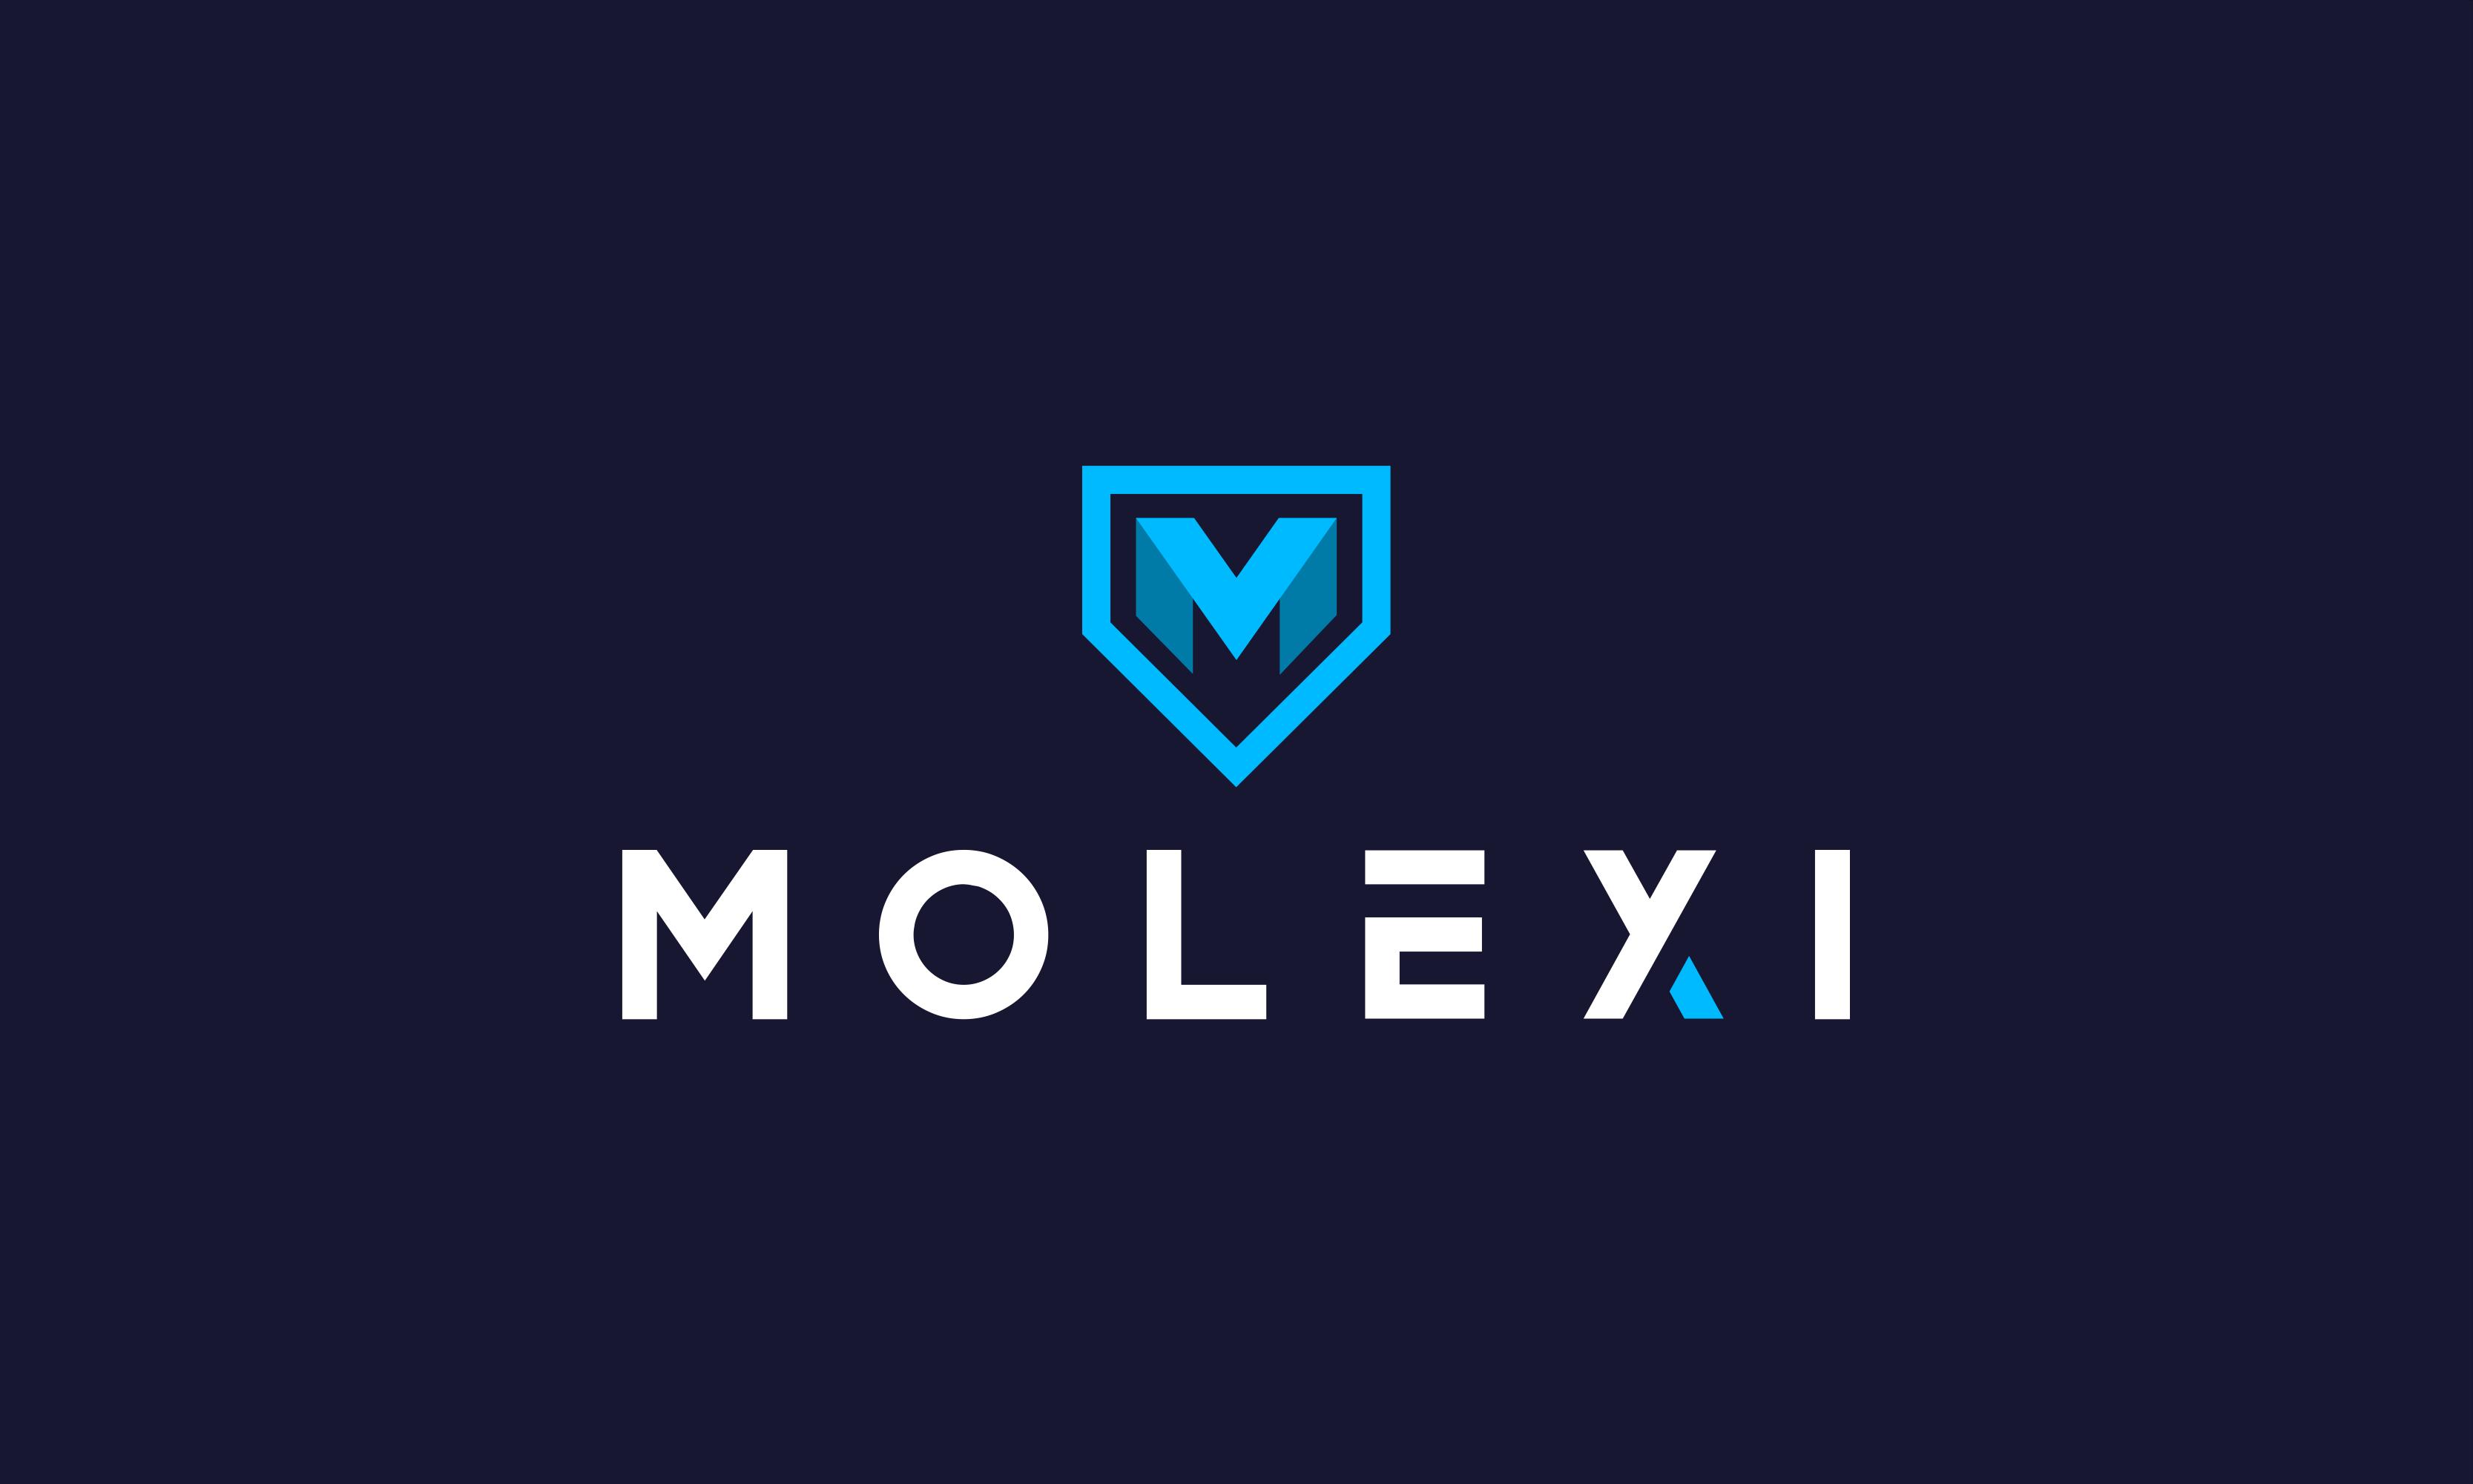 Molexi